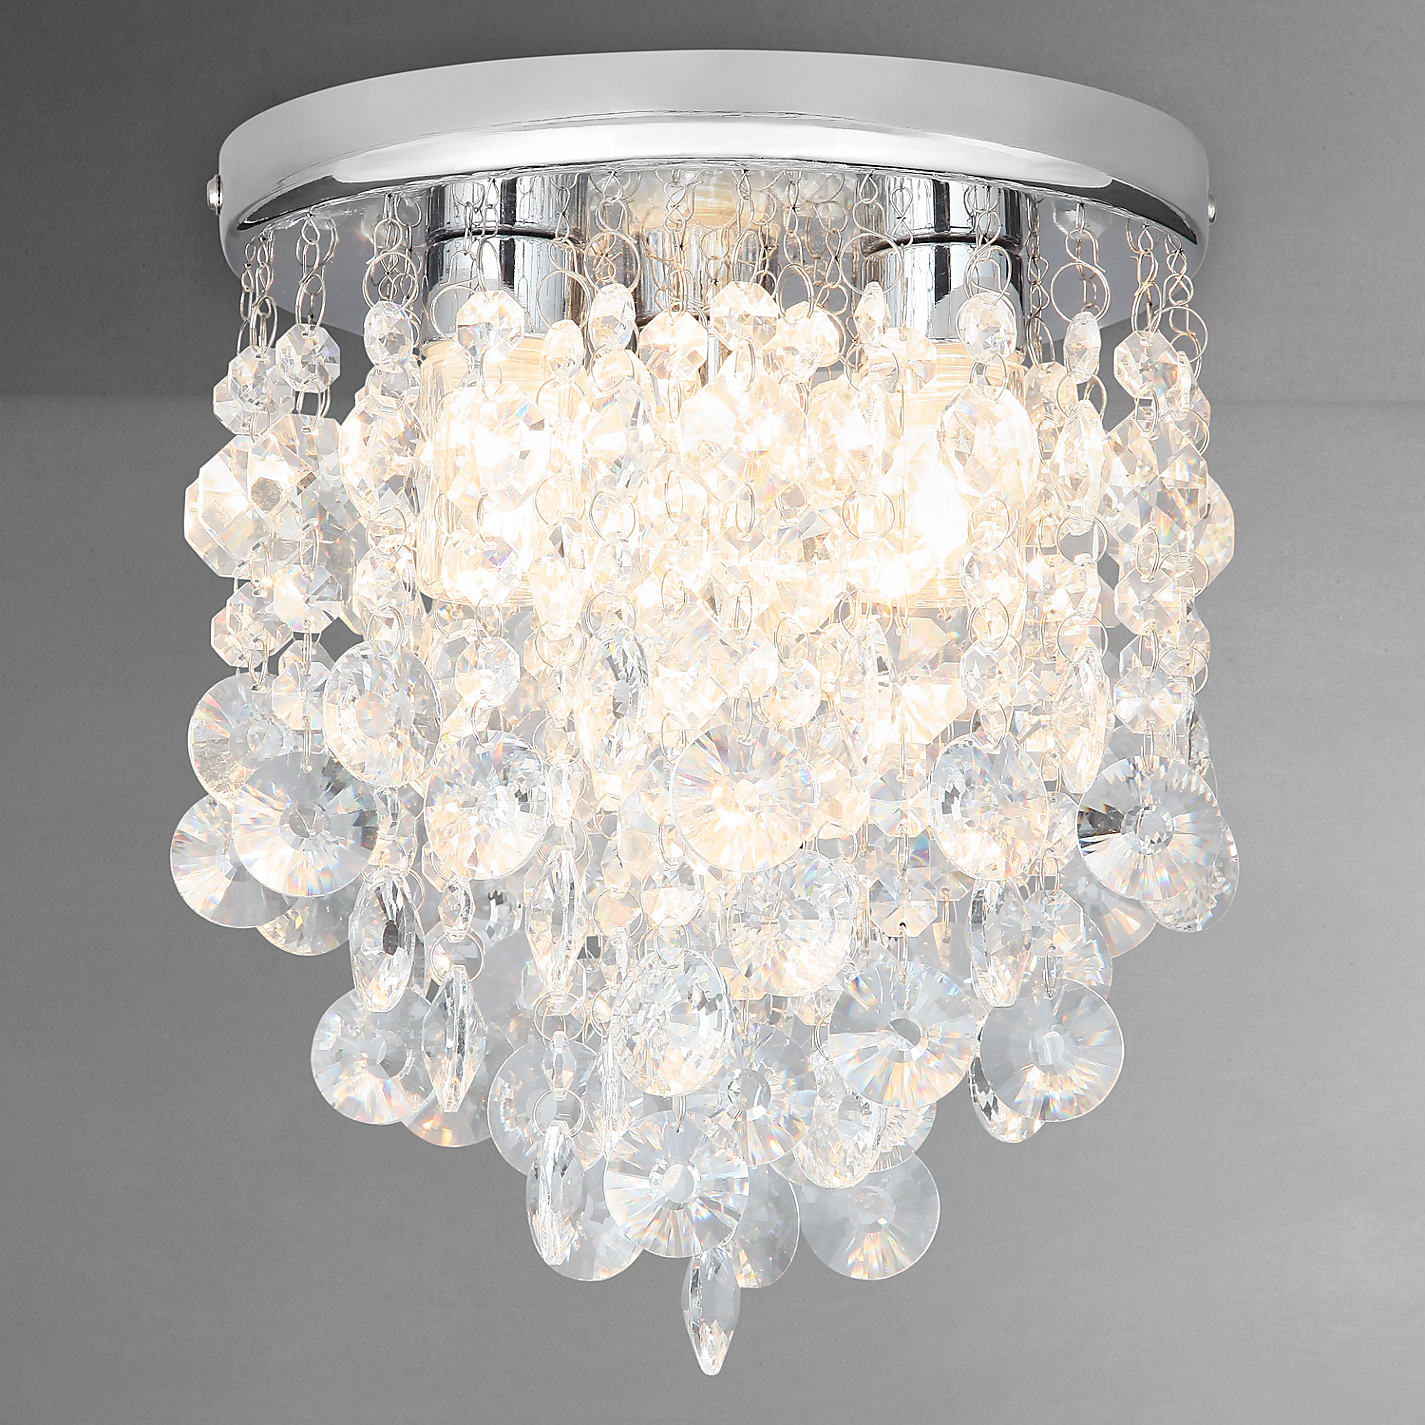 Buy john lewis katelyn crystal bathroom flush ceiling light john buy john lewis katelyn crystal bathroom flush ceiling light online at johnlewis mozeypictures Gallery